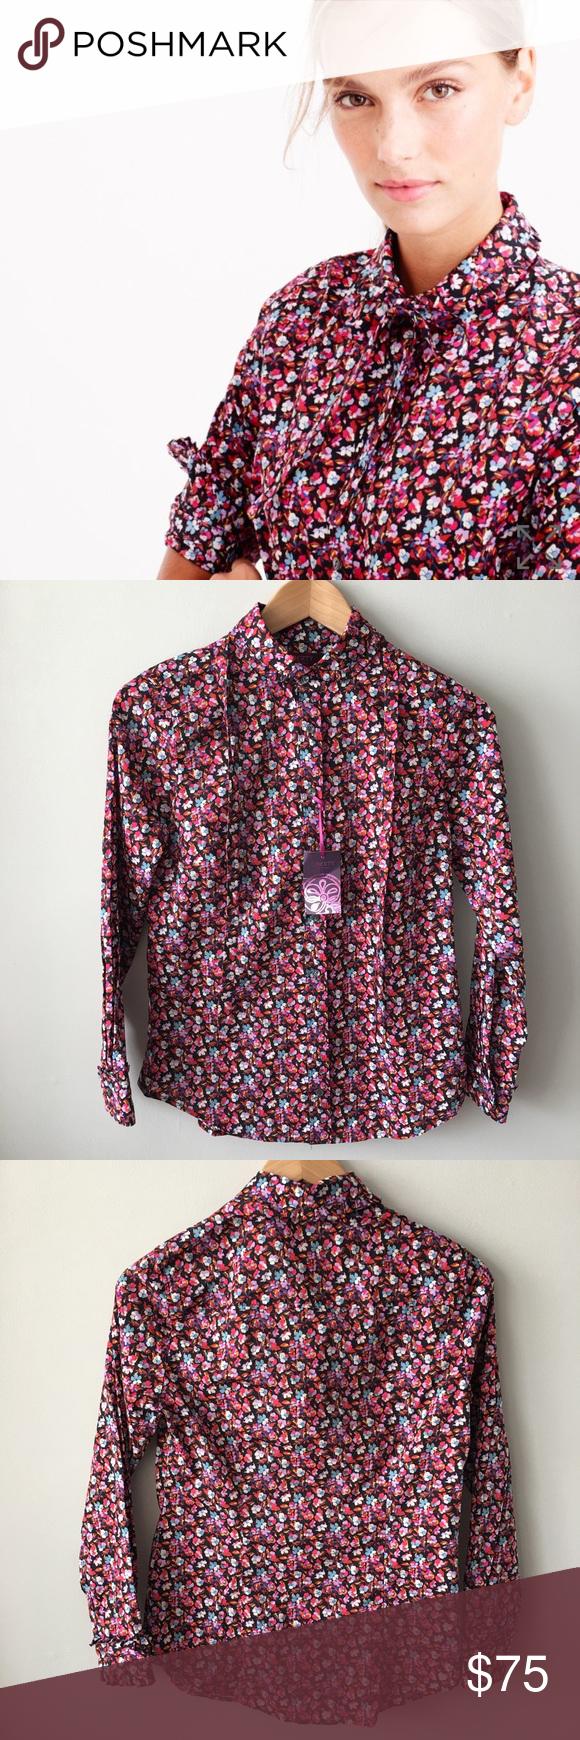 J. Crew Tie-Neck Tuxedo Shirt -Liberty Art Fabric NWT | Camisas ...